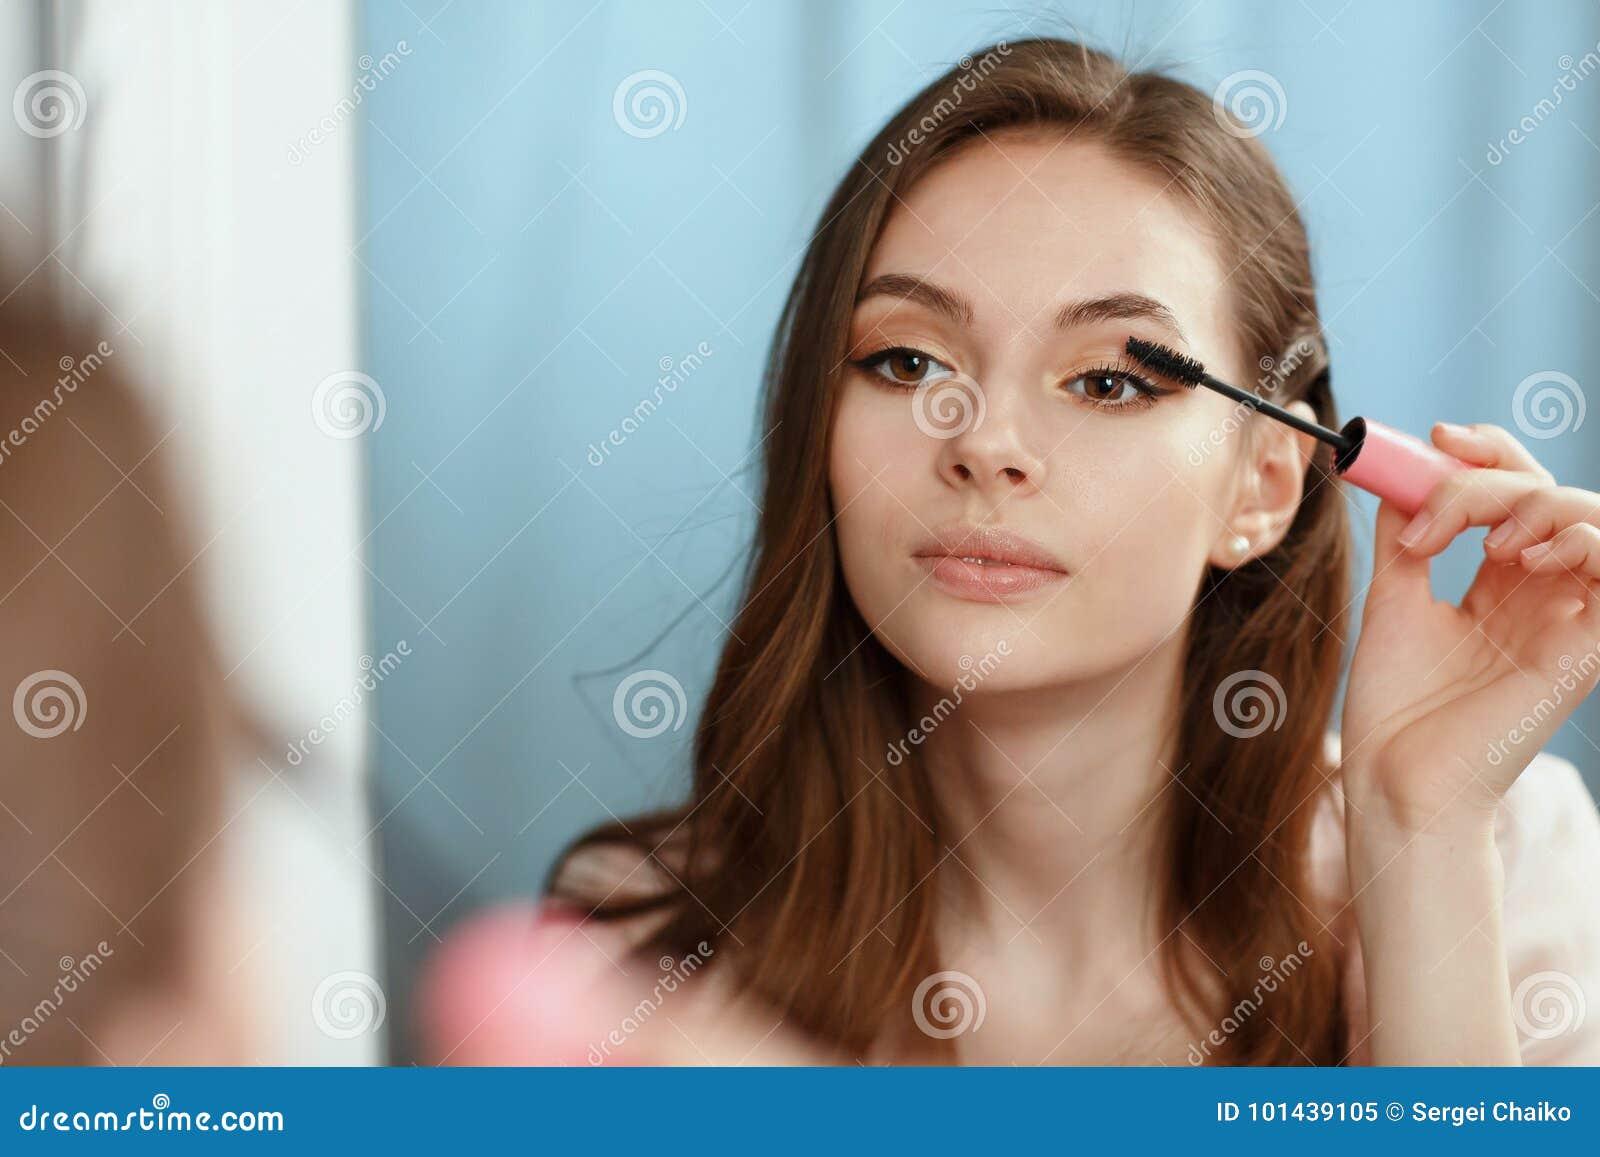 7d006fd9062e Το νέο όμορφο κορίτσι γίνεται ένα Makeup μπροστά από έναν καθρέφτη ...